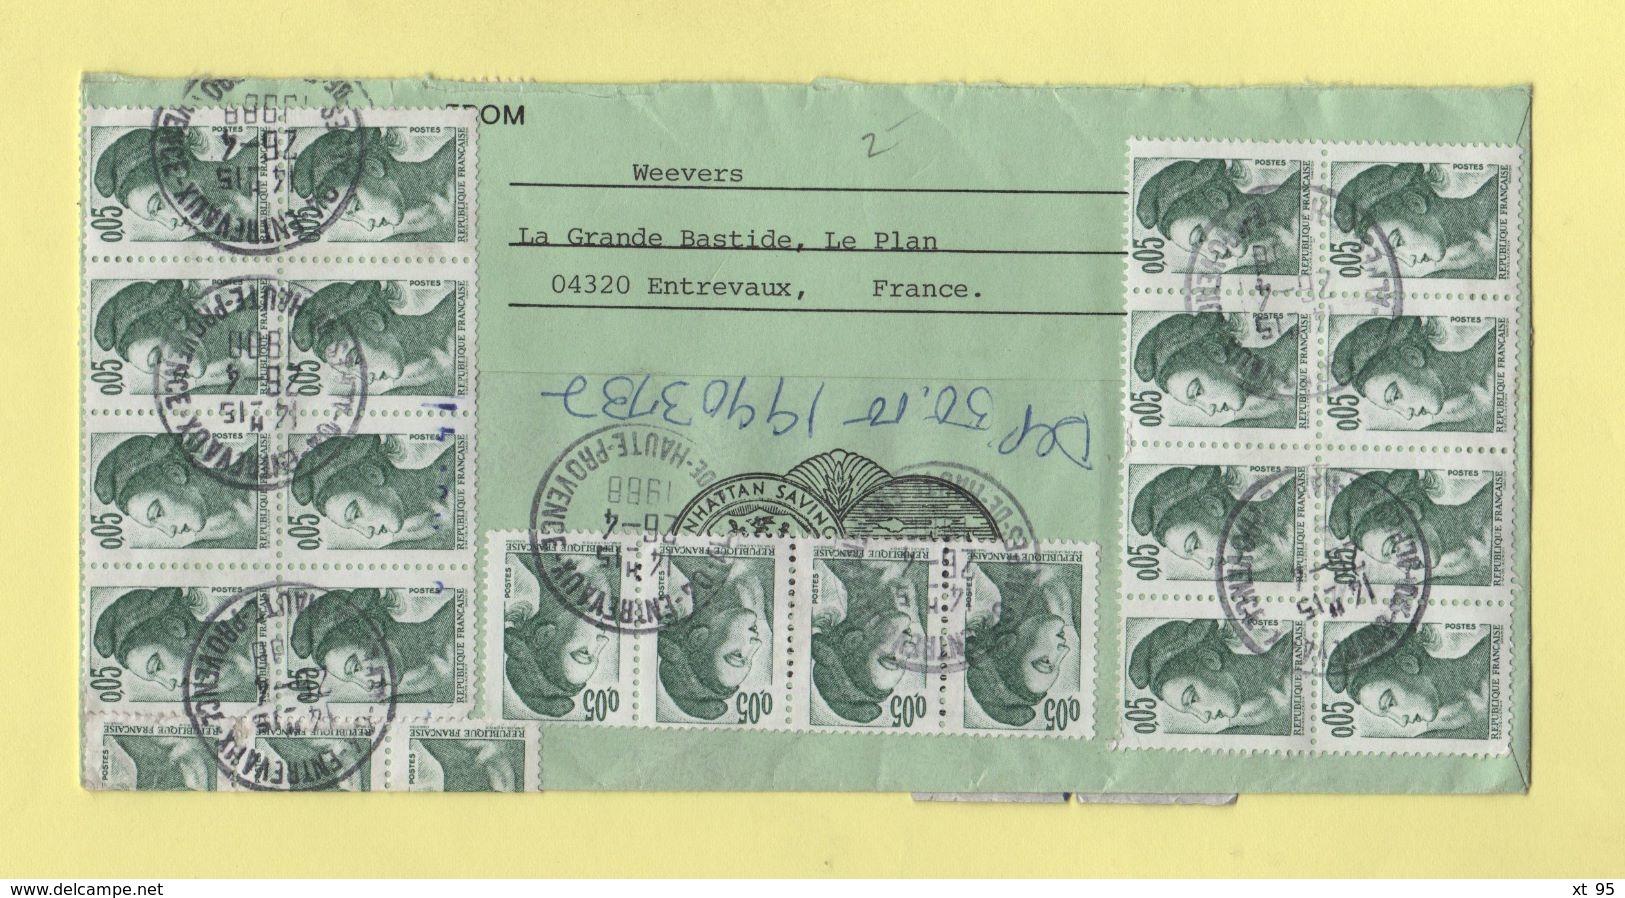 Liberte De Gandon - Entrevaux - Destination New York - 26-4-1988 - Alpes Haute Provence - Postmark Collection (Covers)